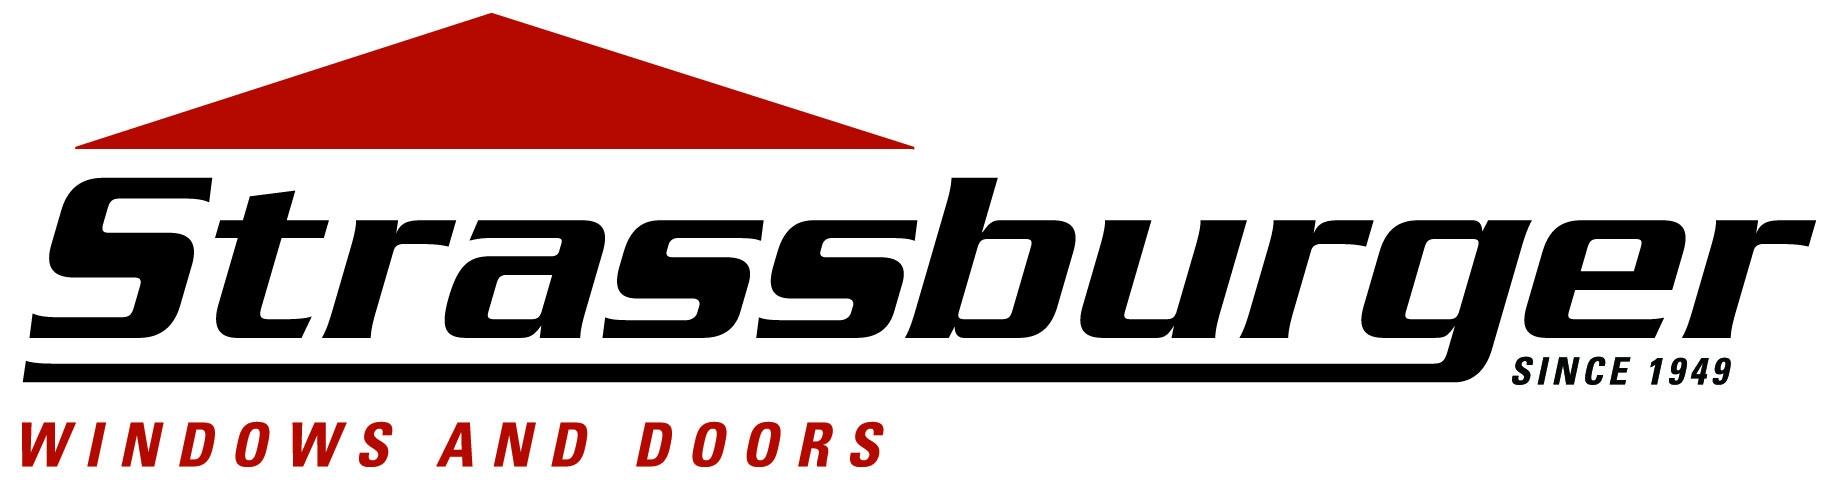 Strassburger Windows and Doors